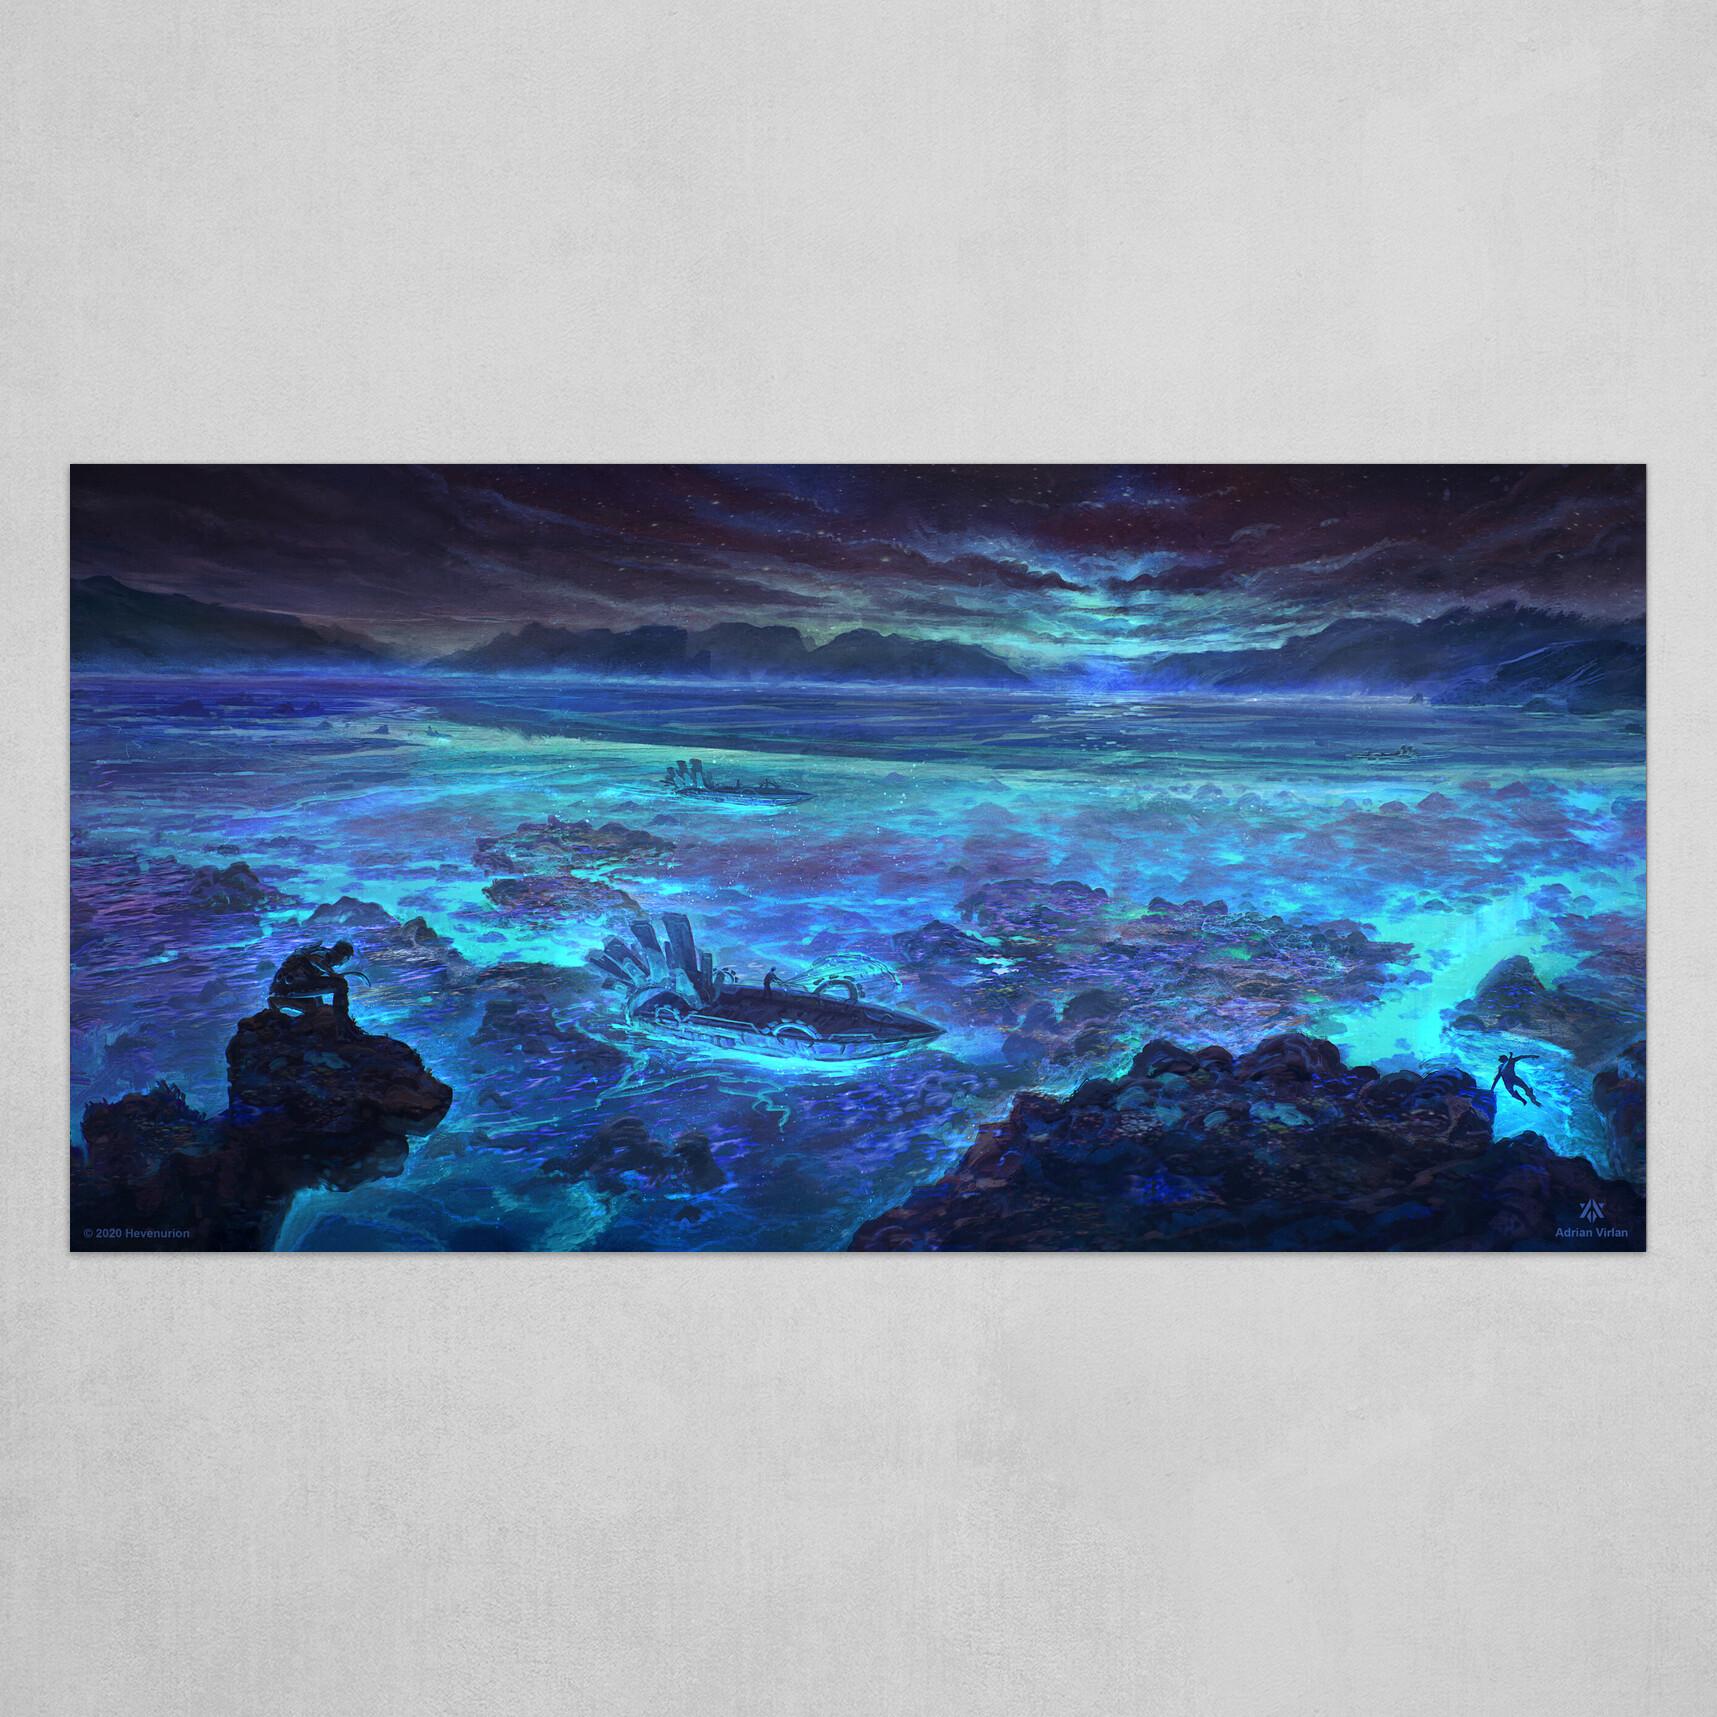 Spectral Reef - Hevenurion